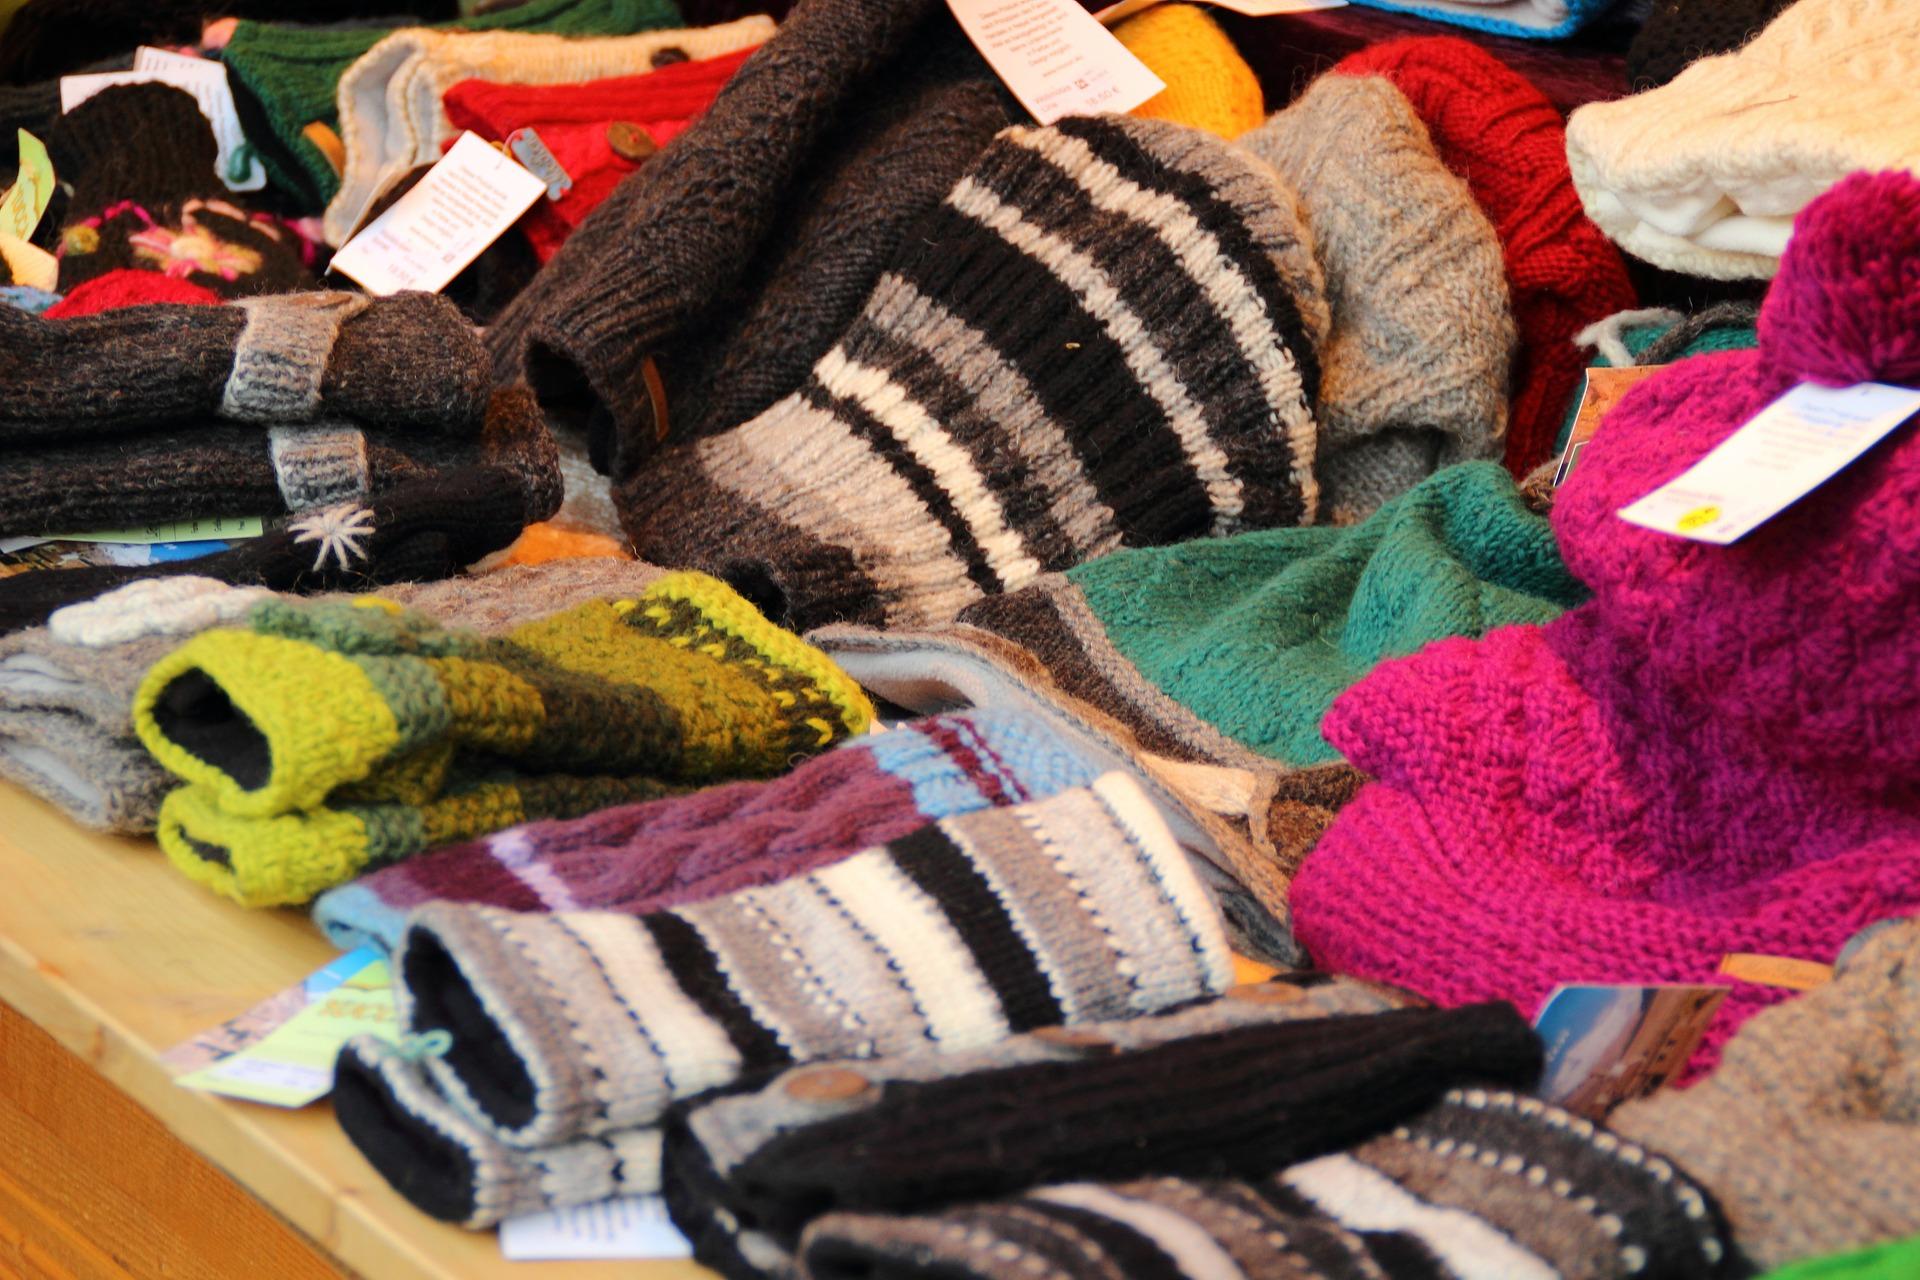 cold-weather accessories merchandising